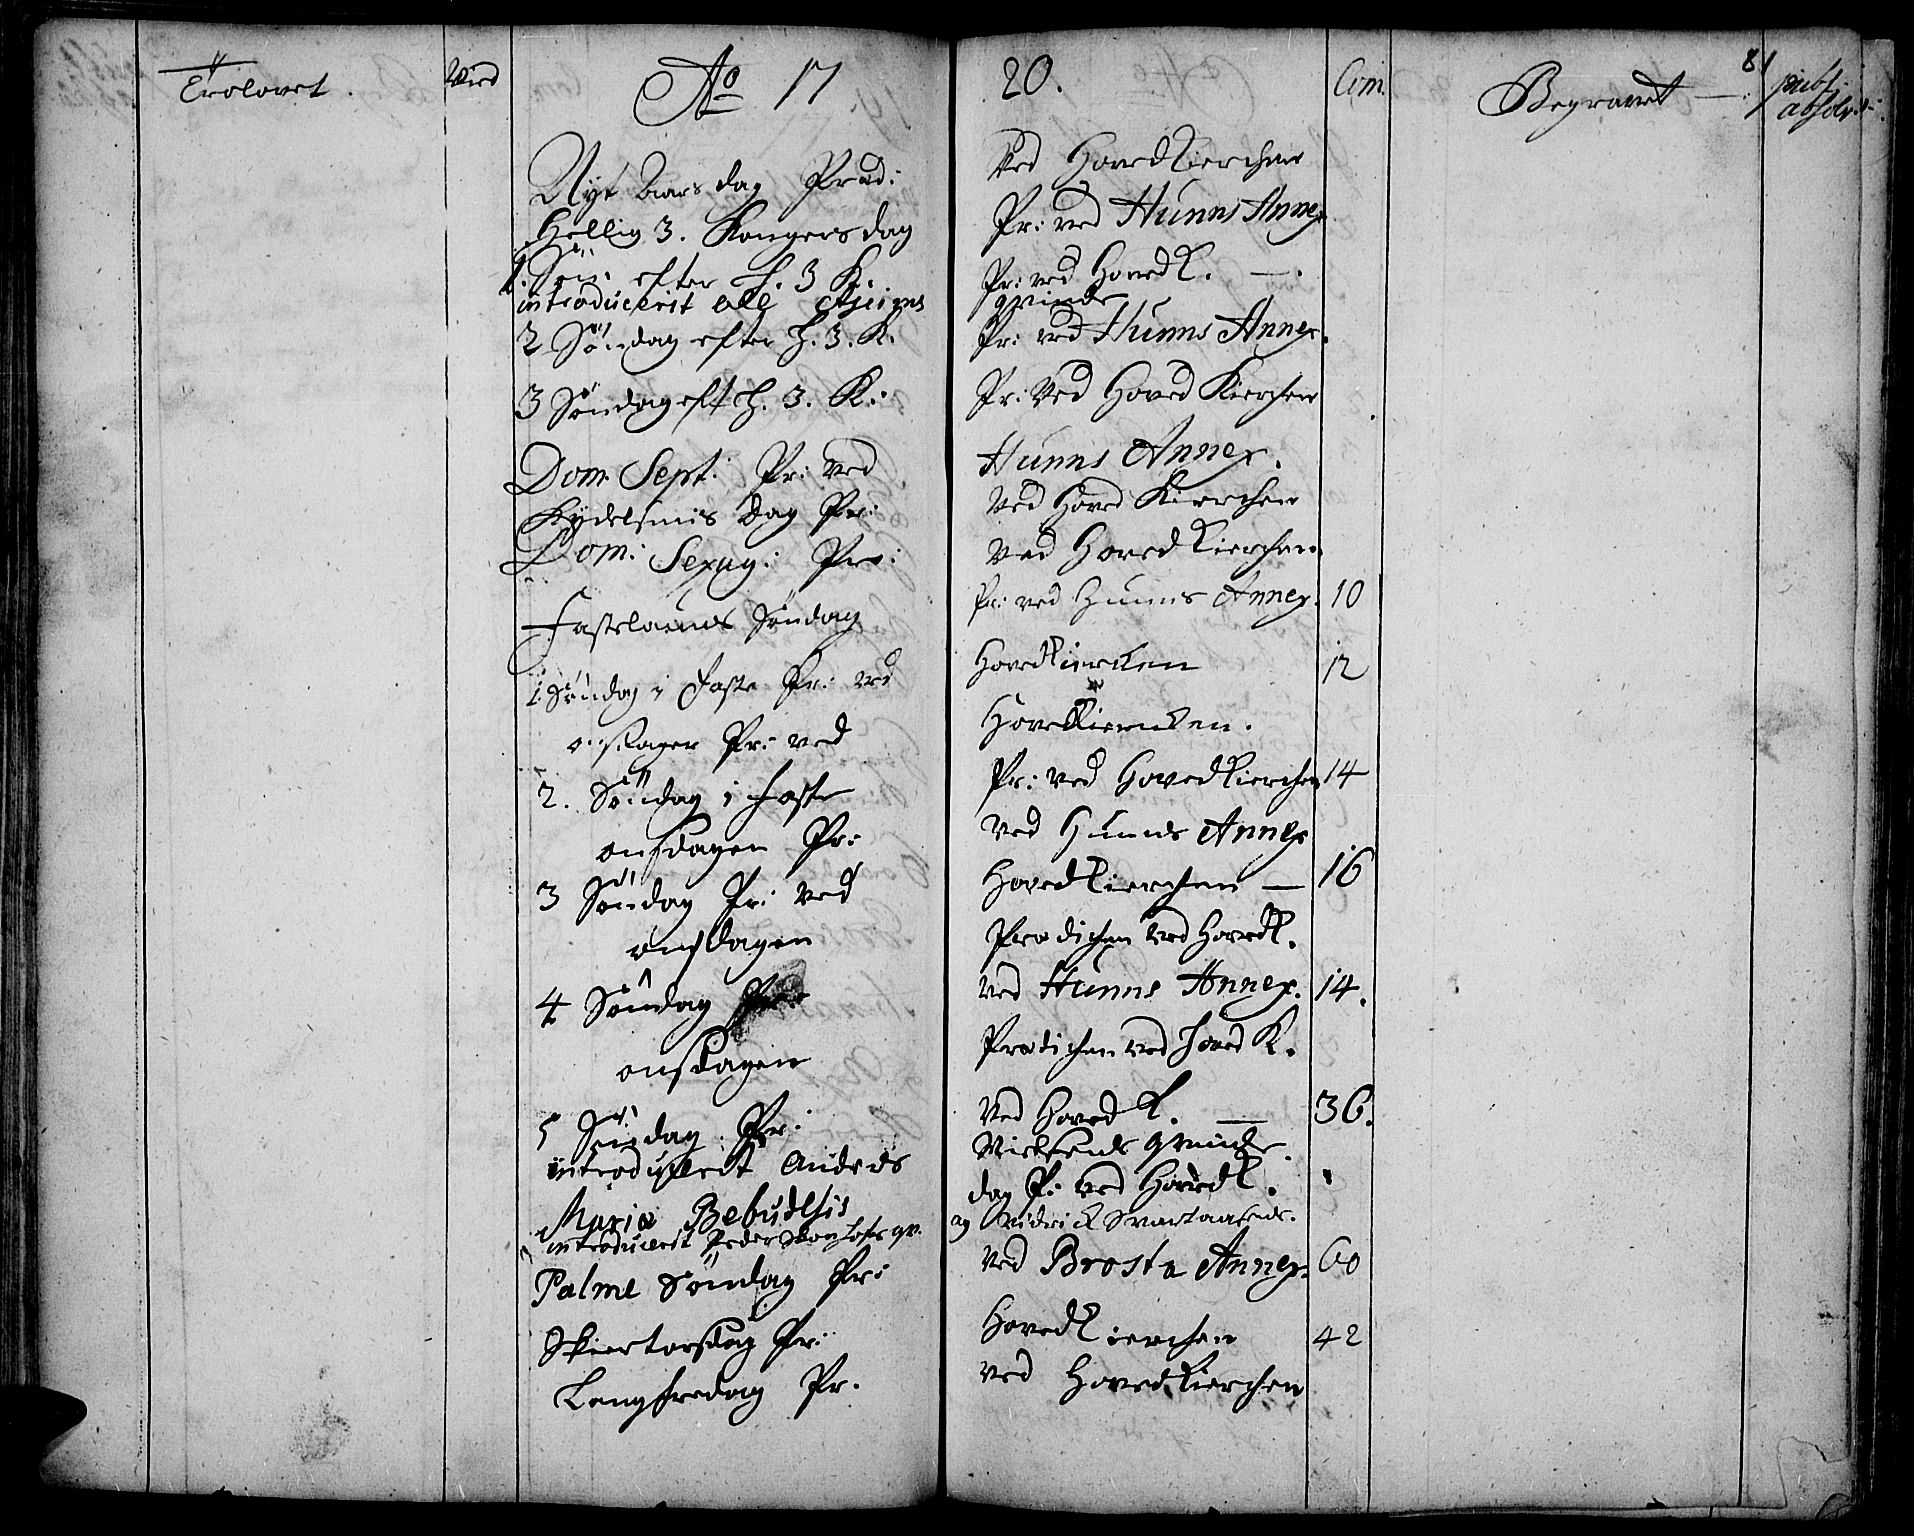 SAH, Vardal prestekontor, H/Ha/Haa/L0001: Ministerialbok nr. 1, 1706-1748, s. 81